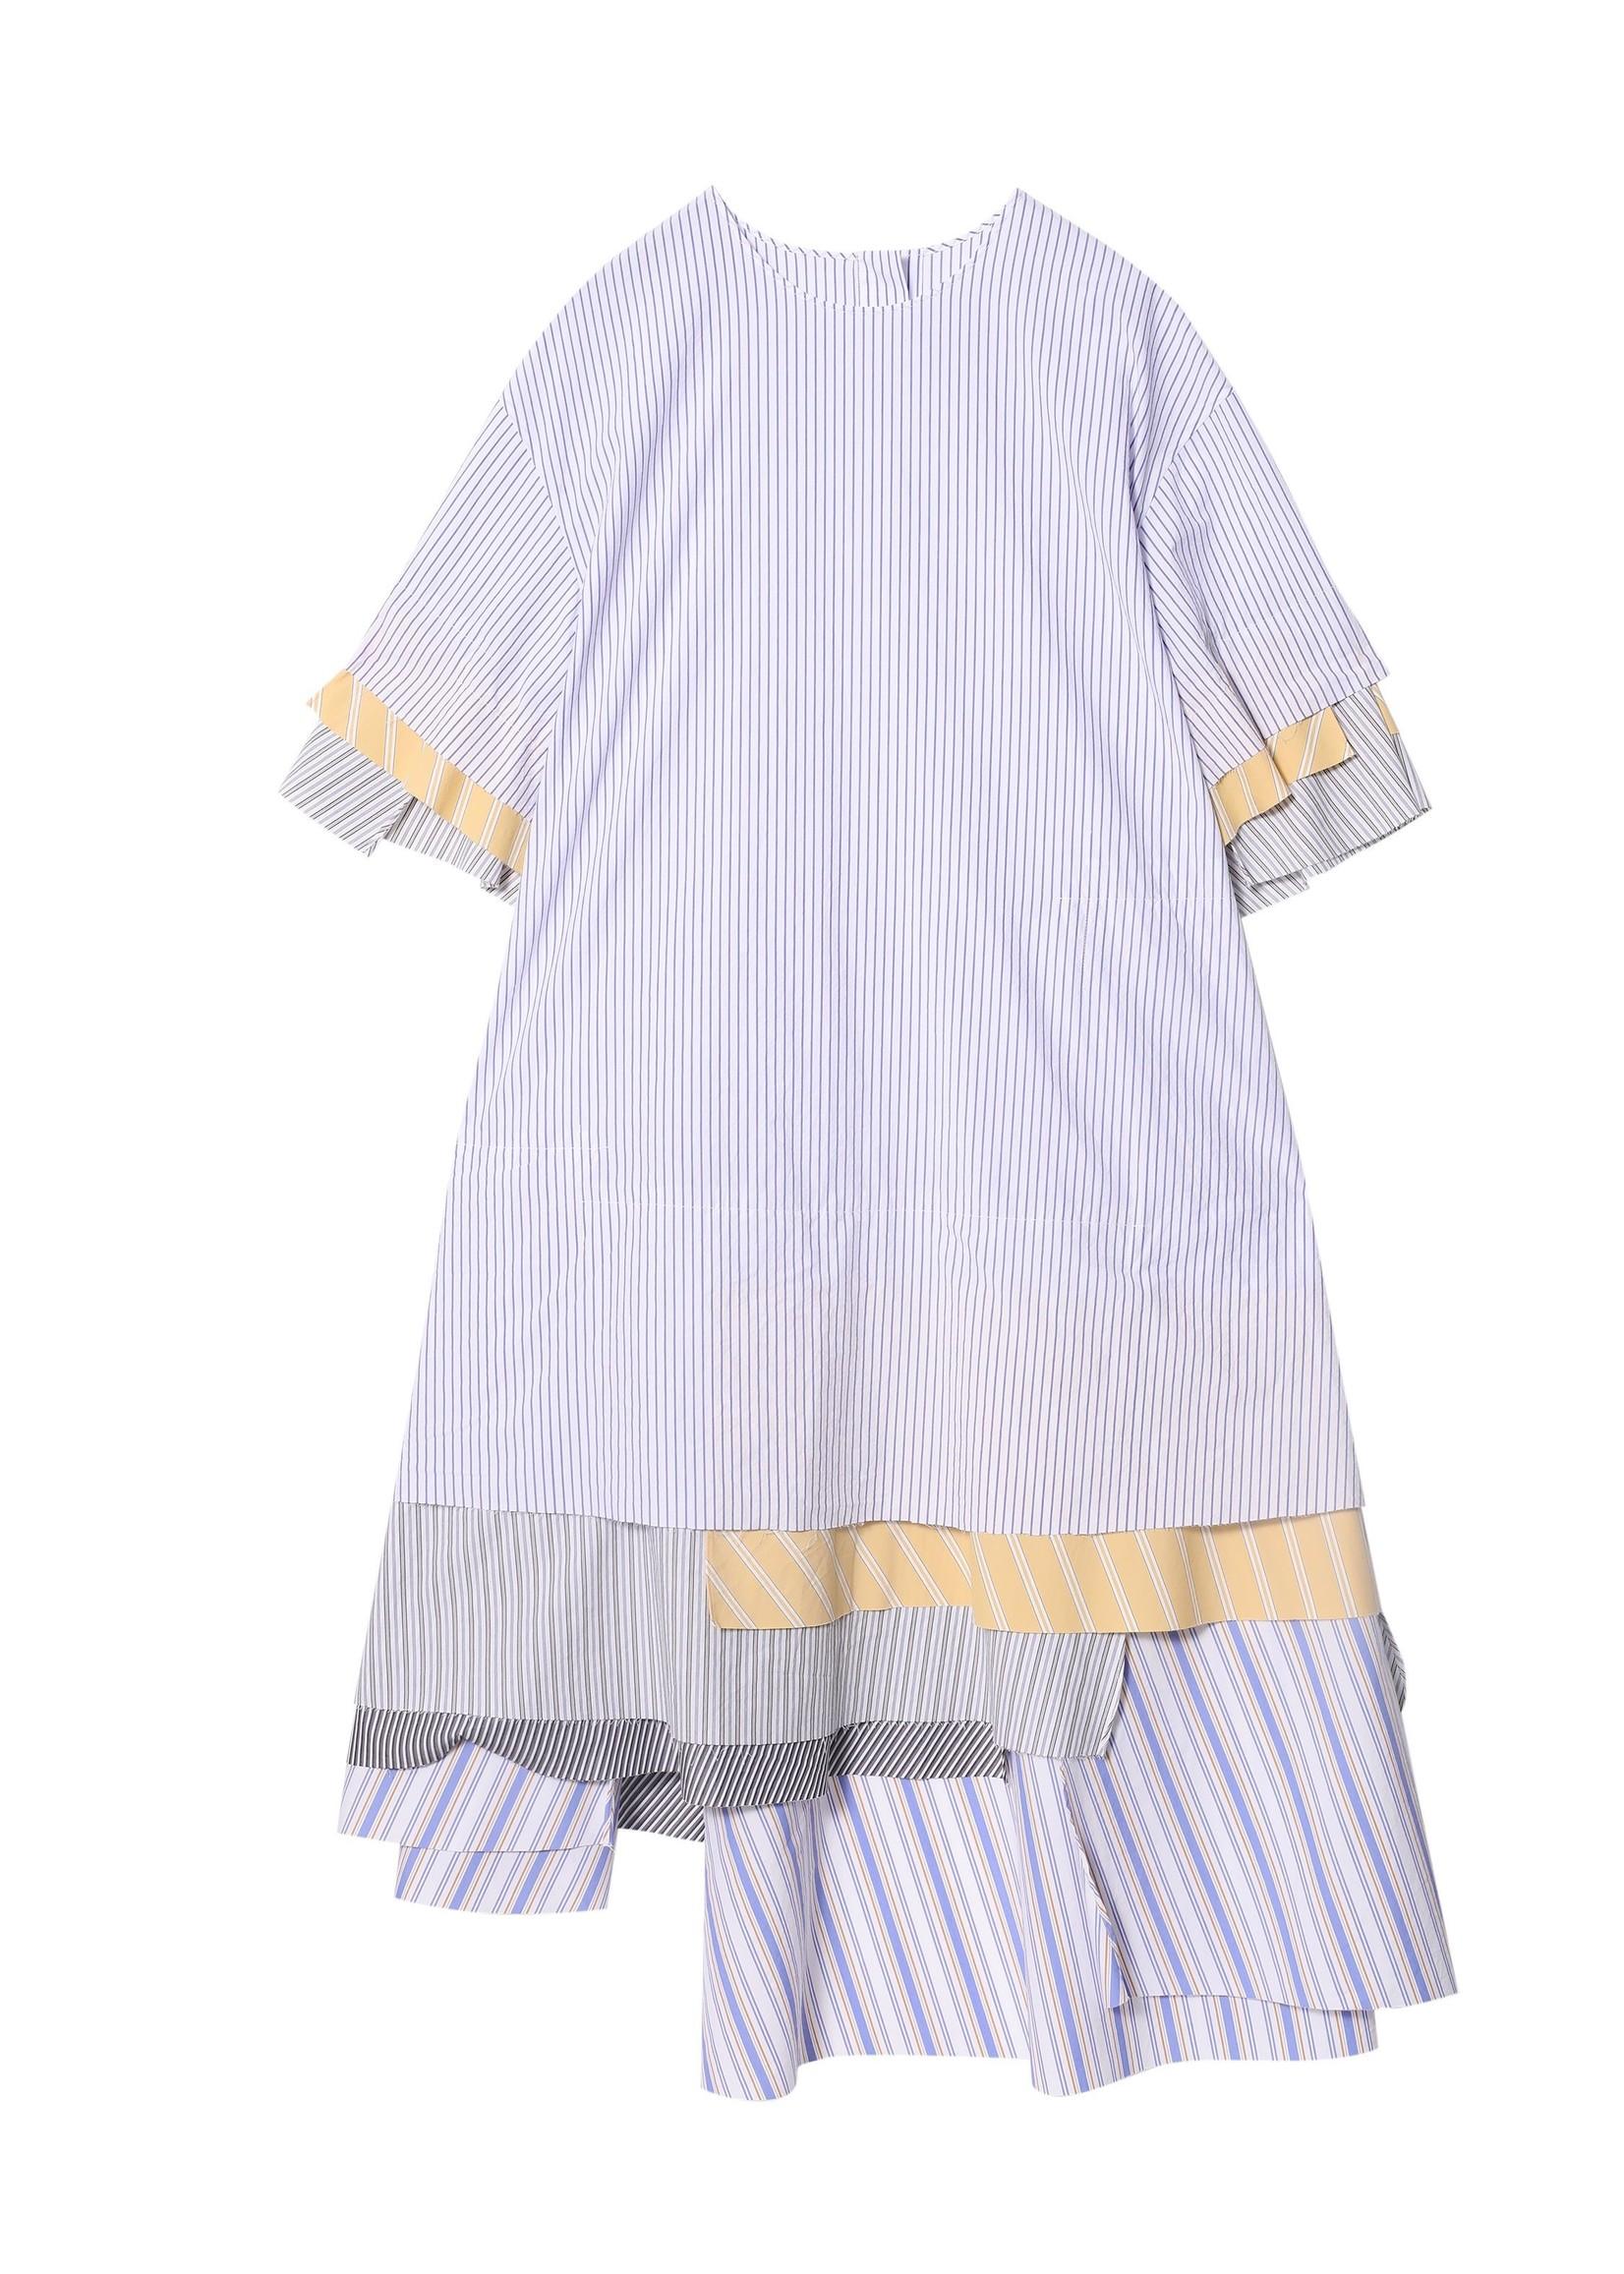 5k3512800 dress